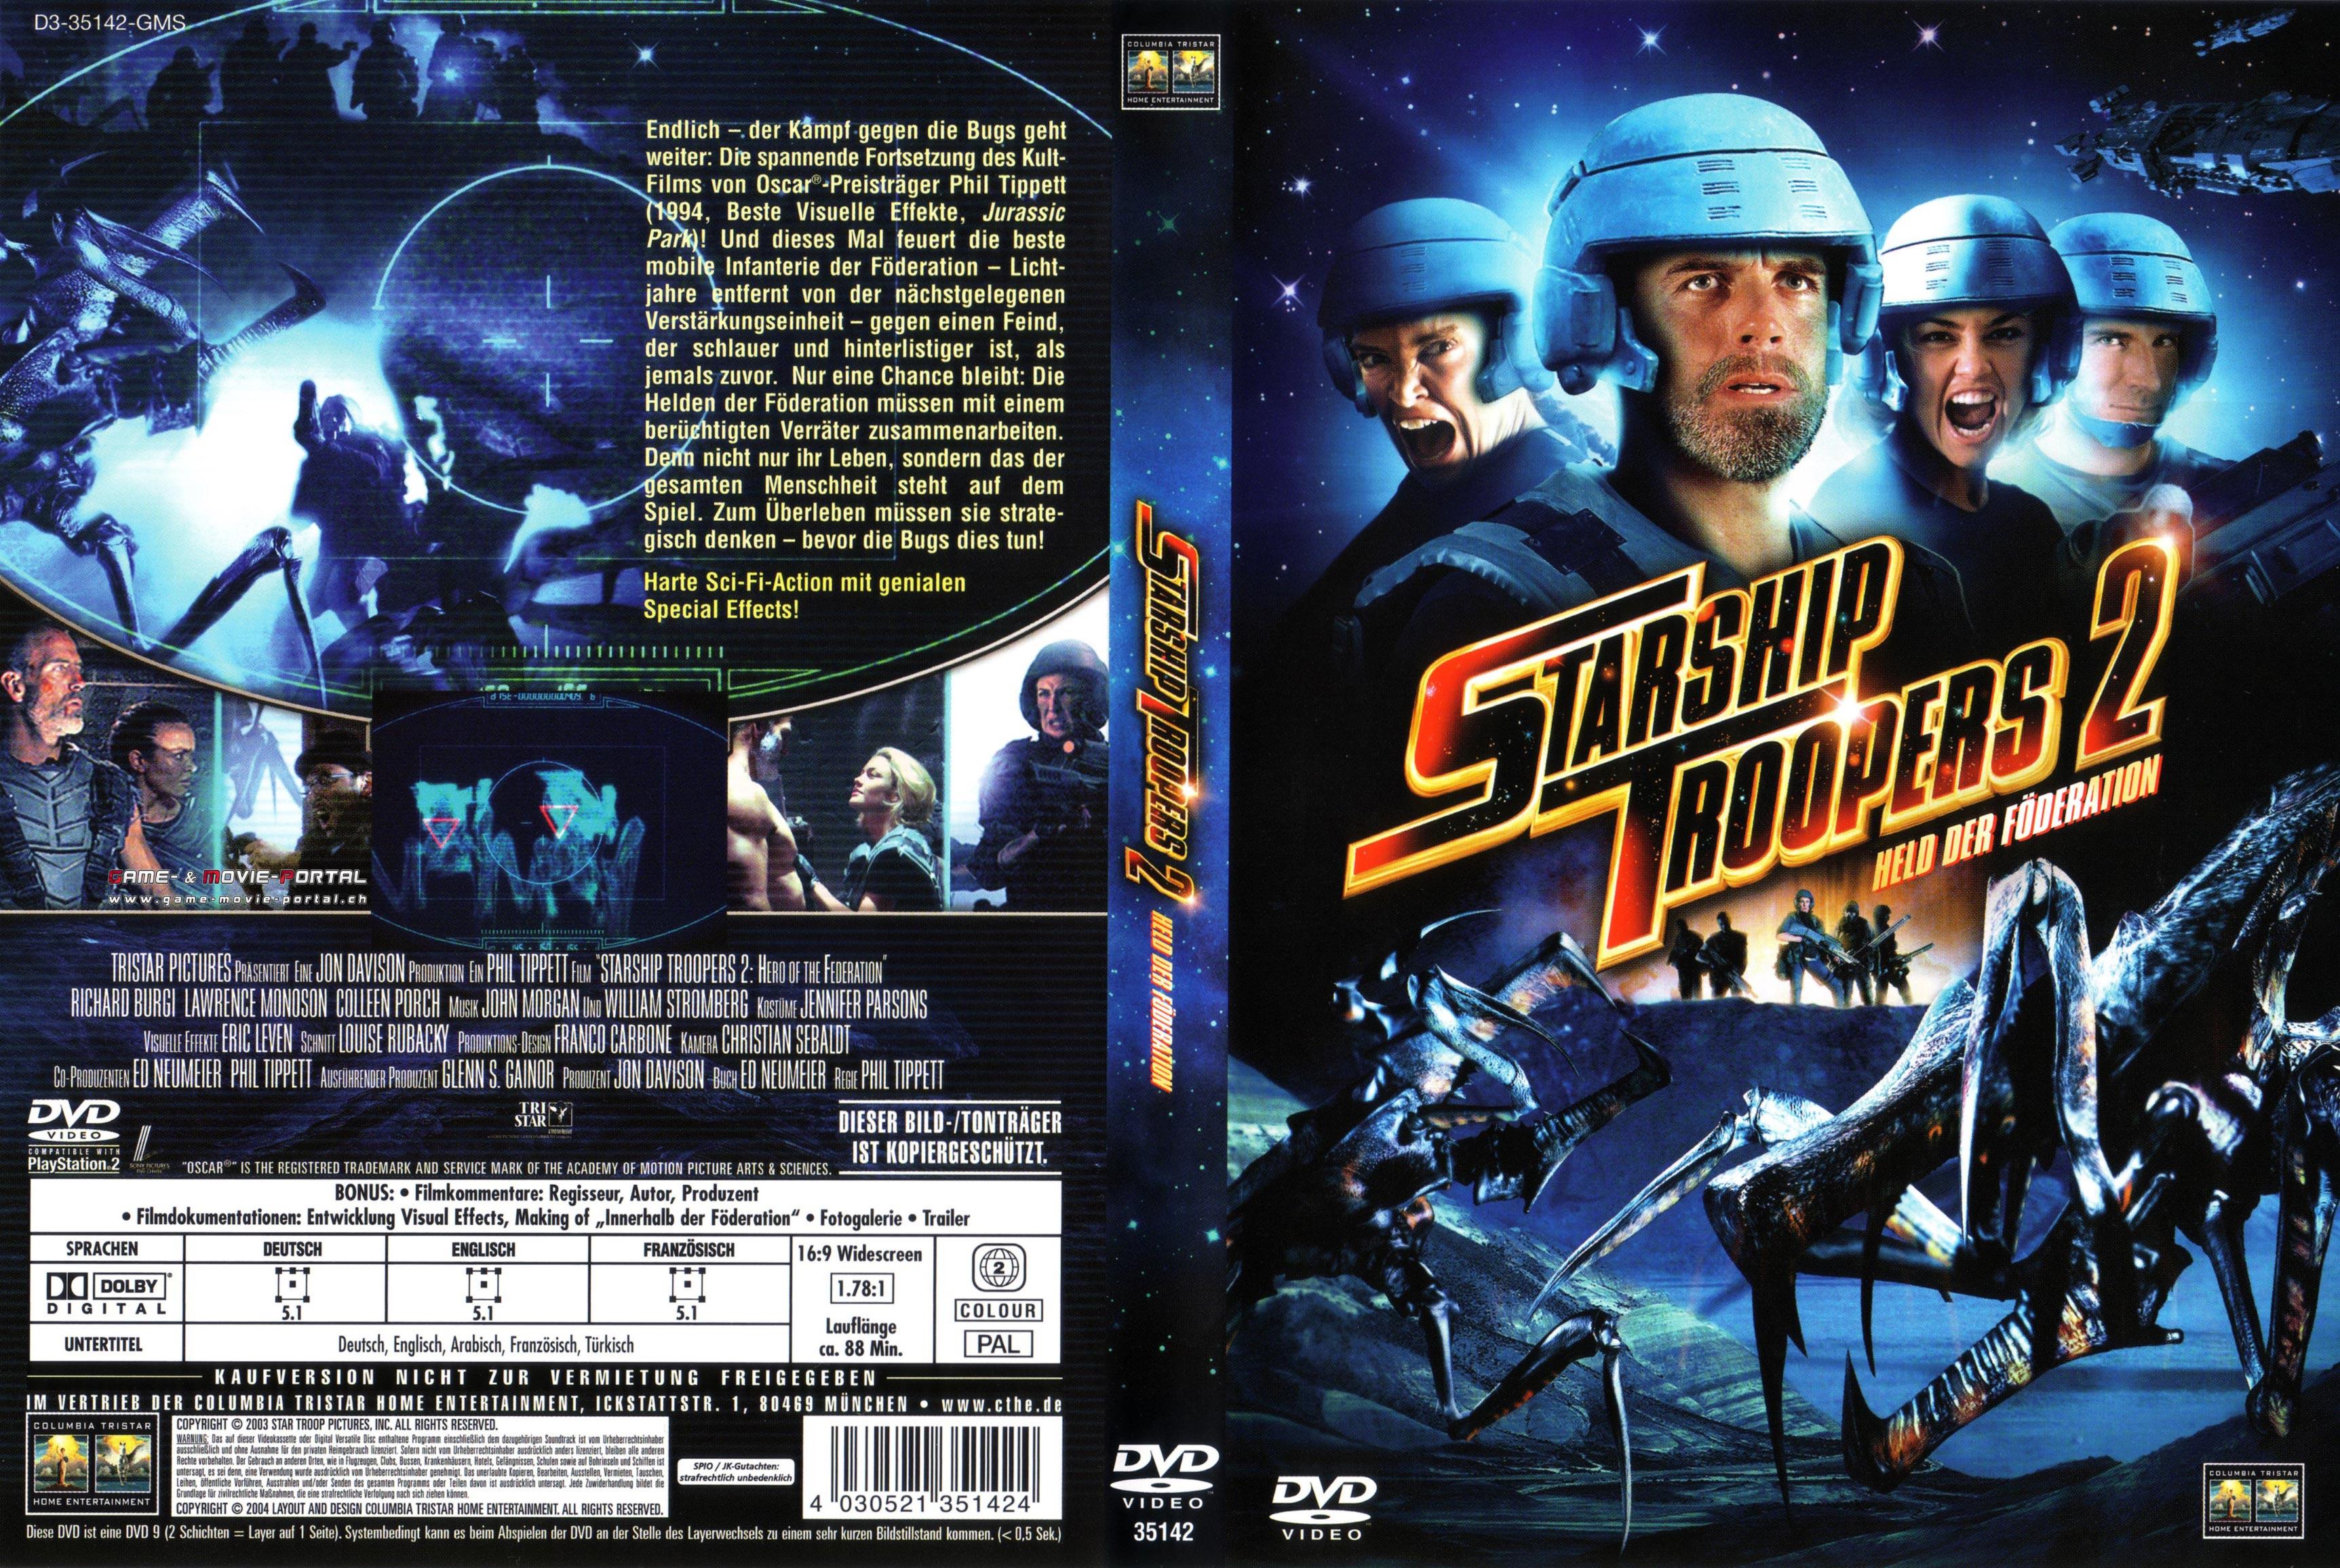 starship troopers 2 dvd cover german german dvd covers